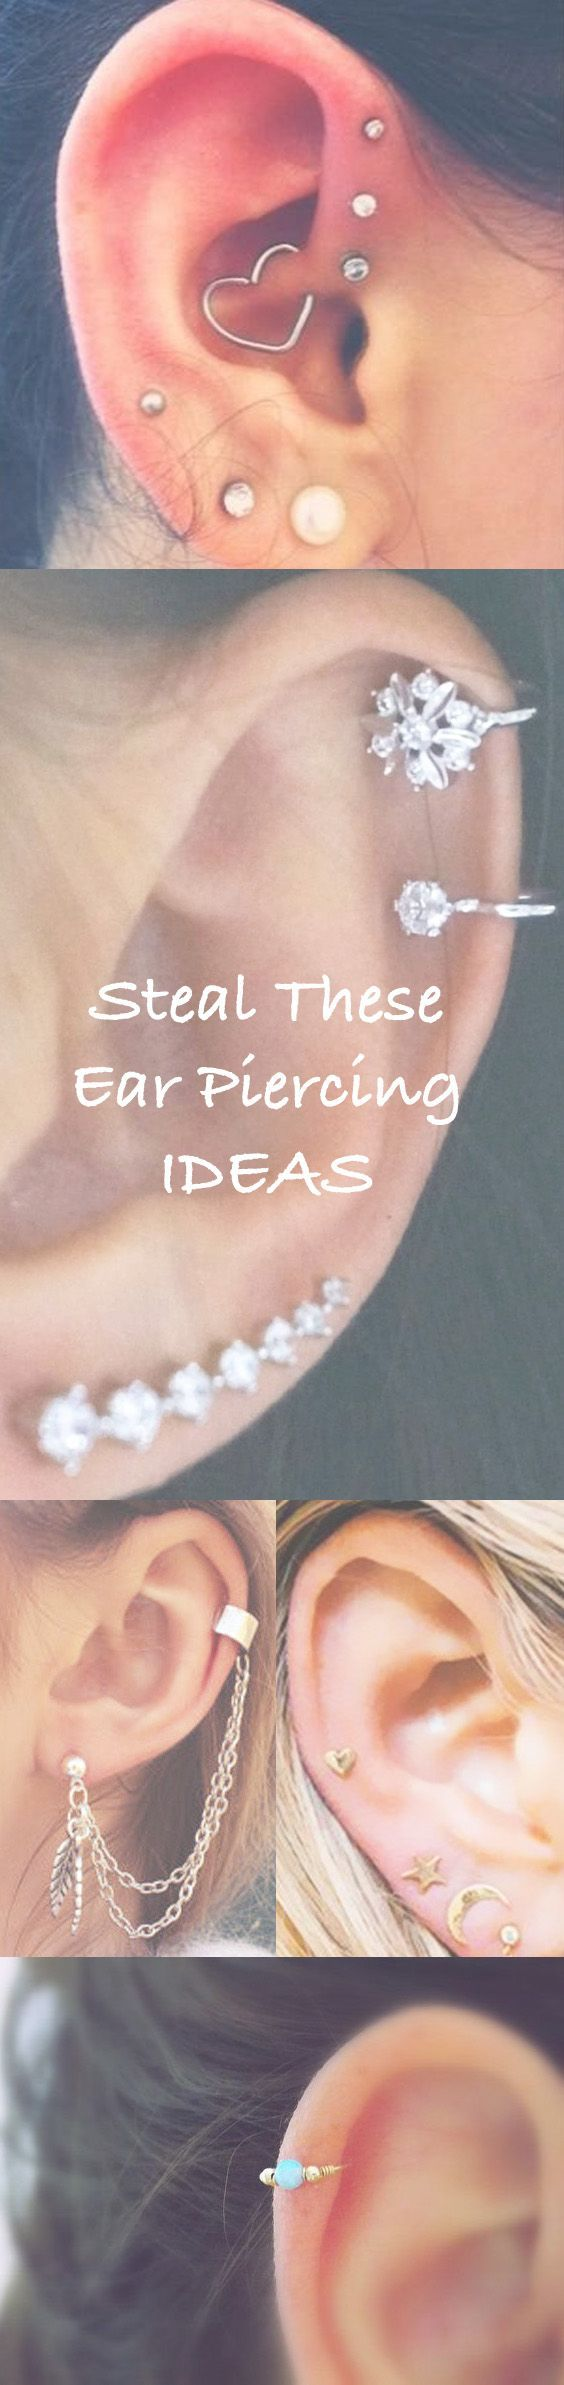 Microdermal piercing ideas  enhancedbuzz  Bijoux  Pinterest  Forward